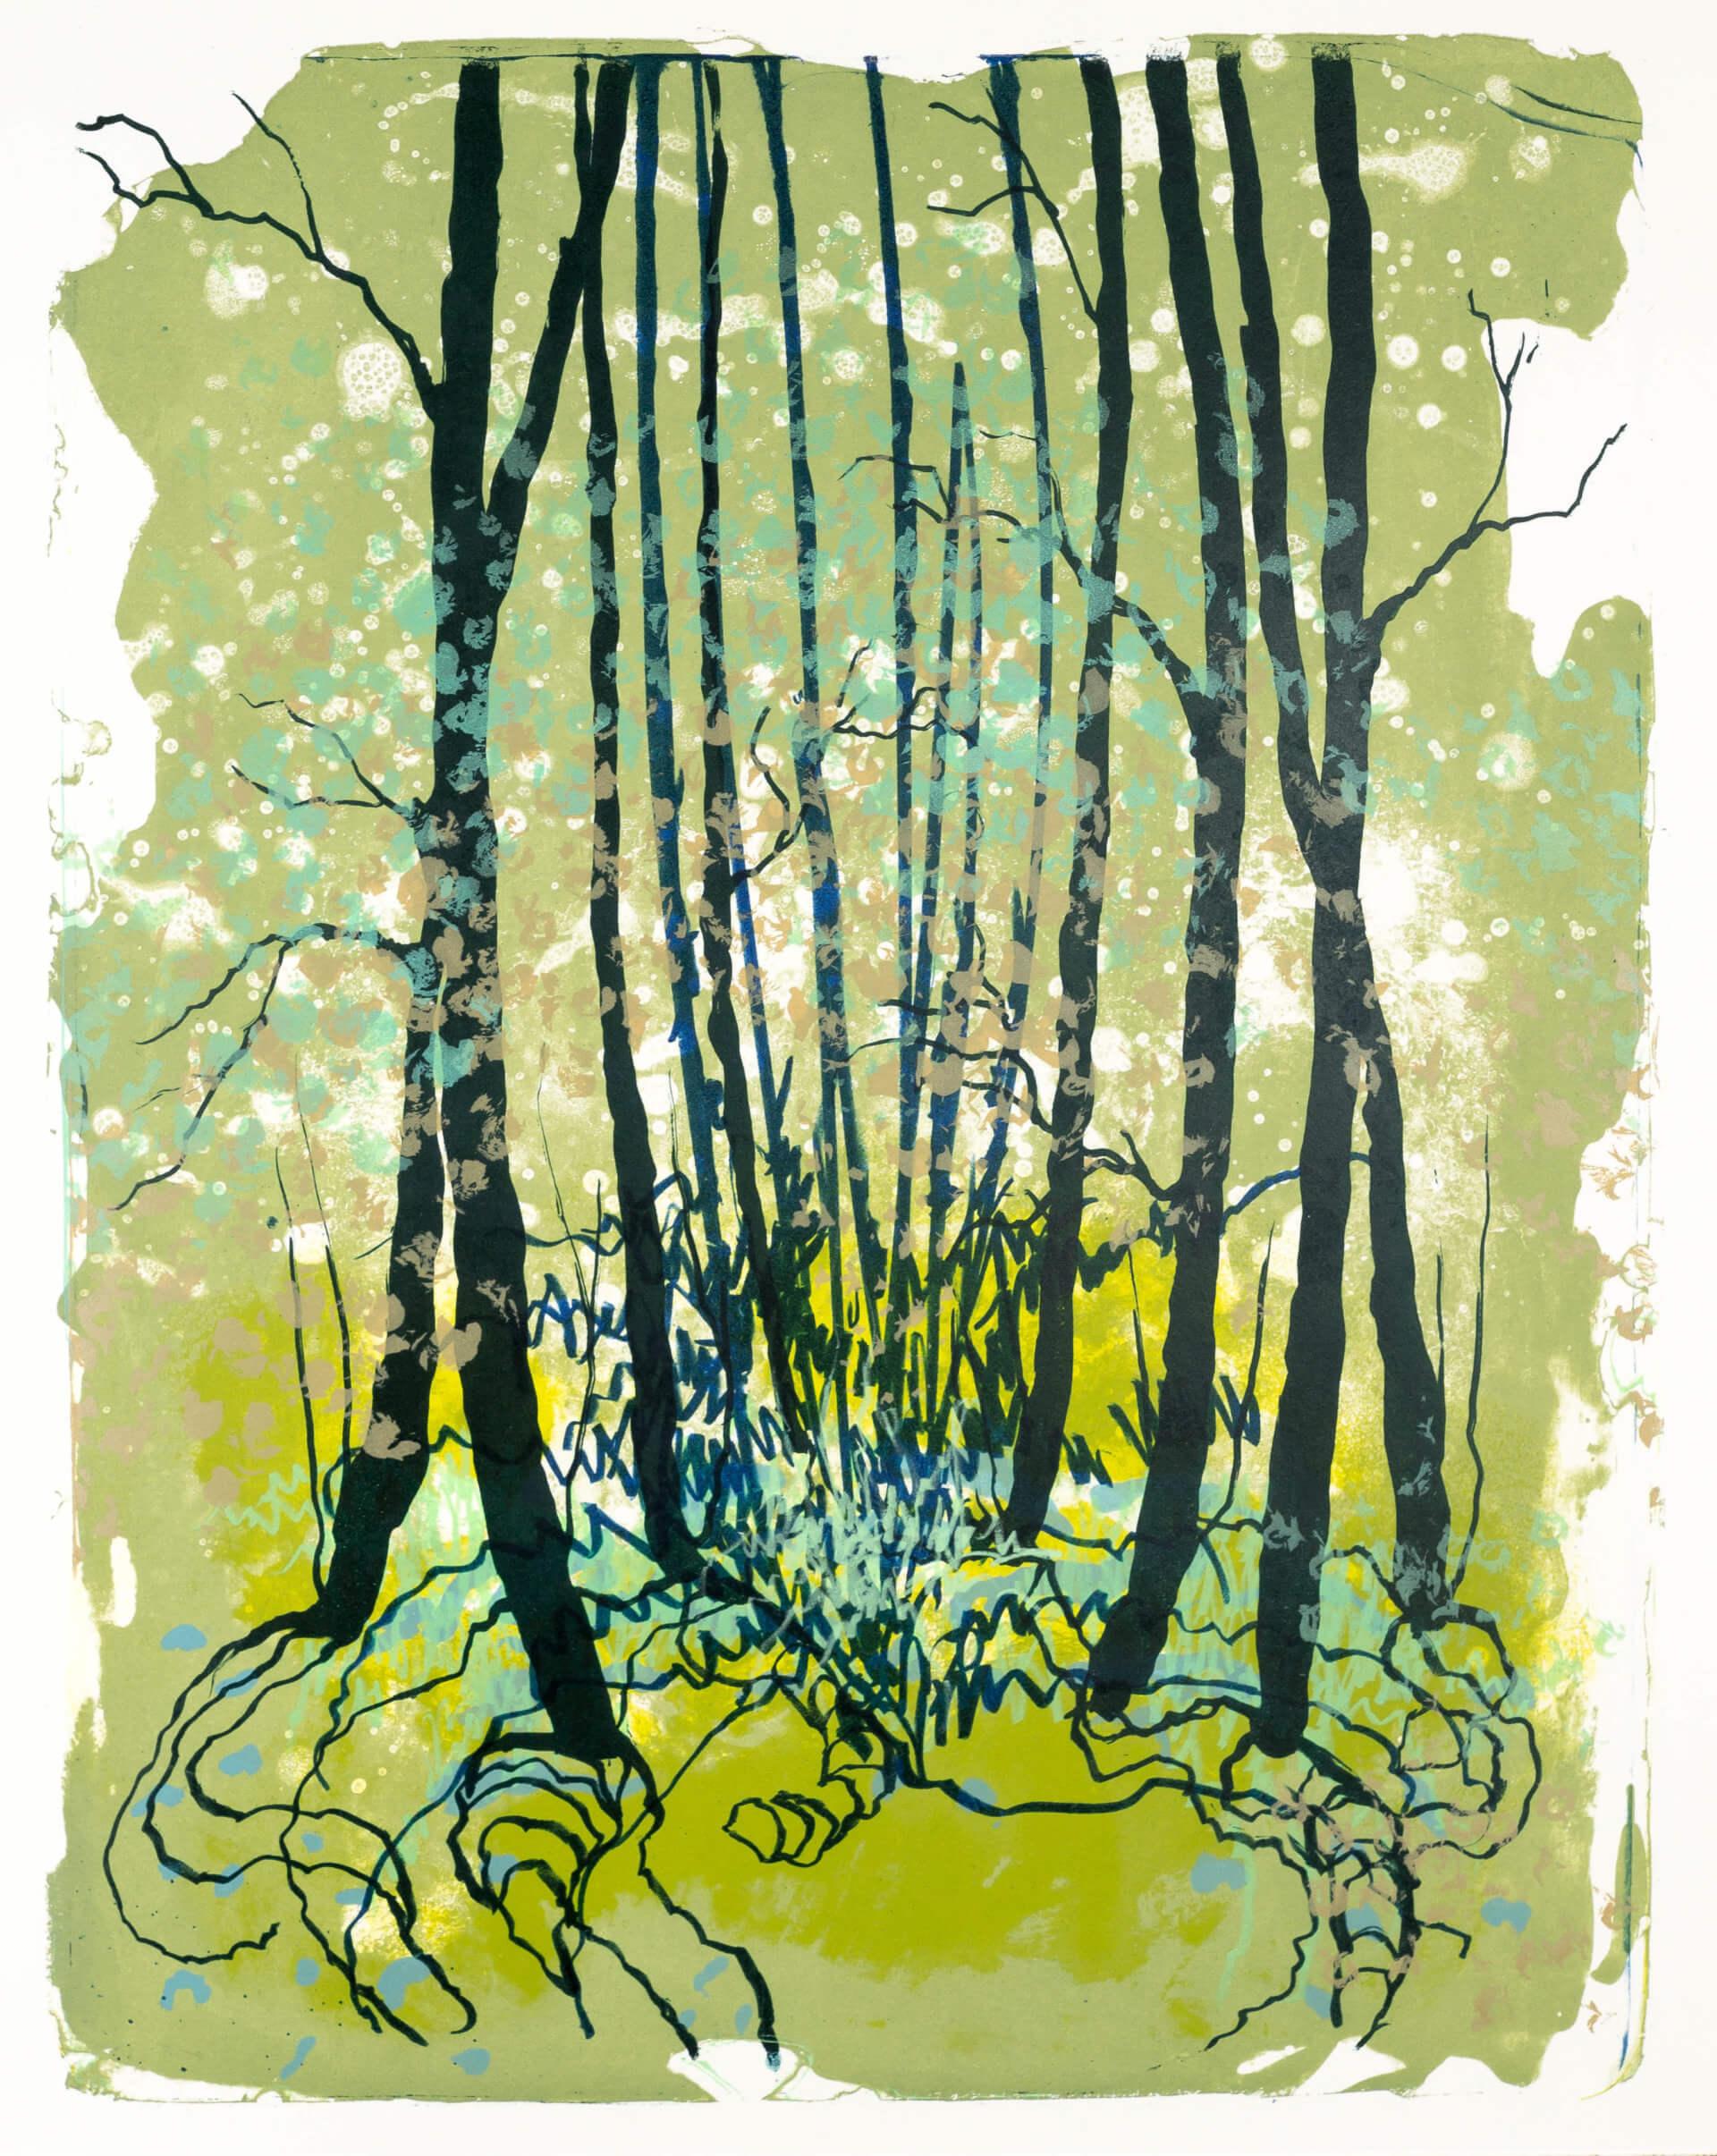 Wald X(D)-XII, 2019, Farblithographie, Unikat, 50x40 cm